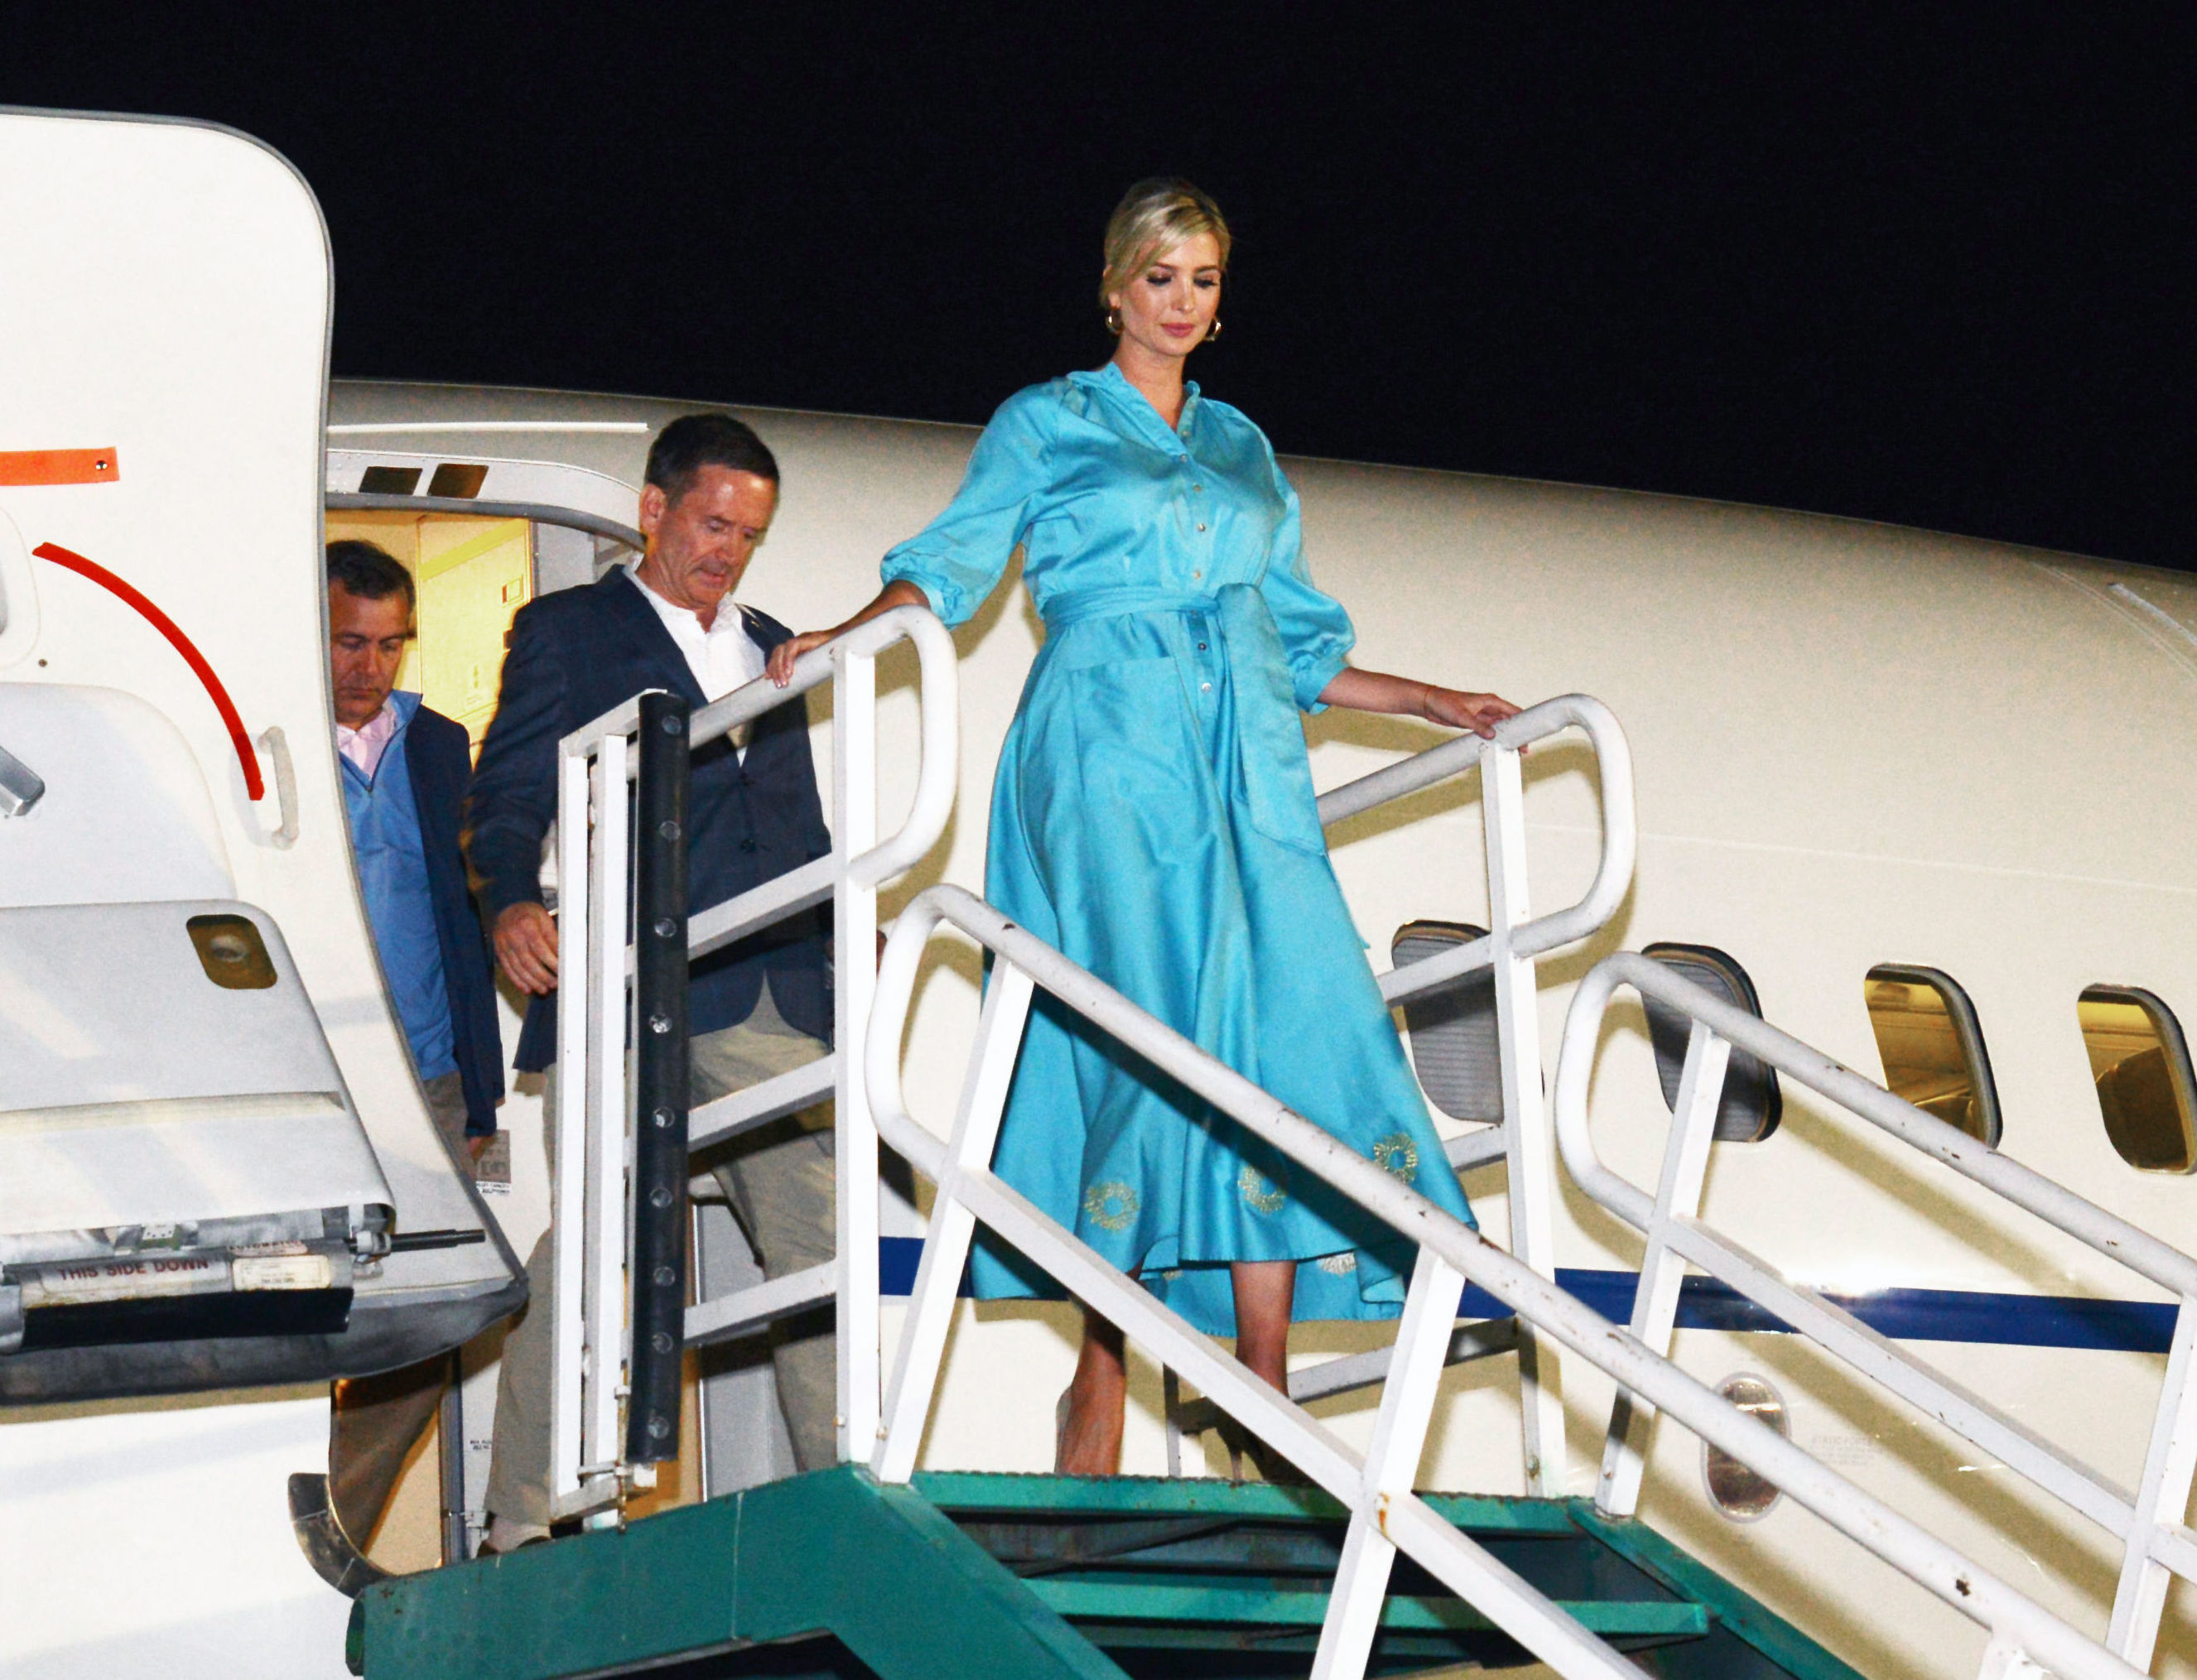 Ivanka Trump a su llegada a la provincia de Jujuy, al noroeste de Argentina